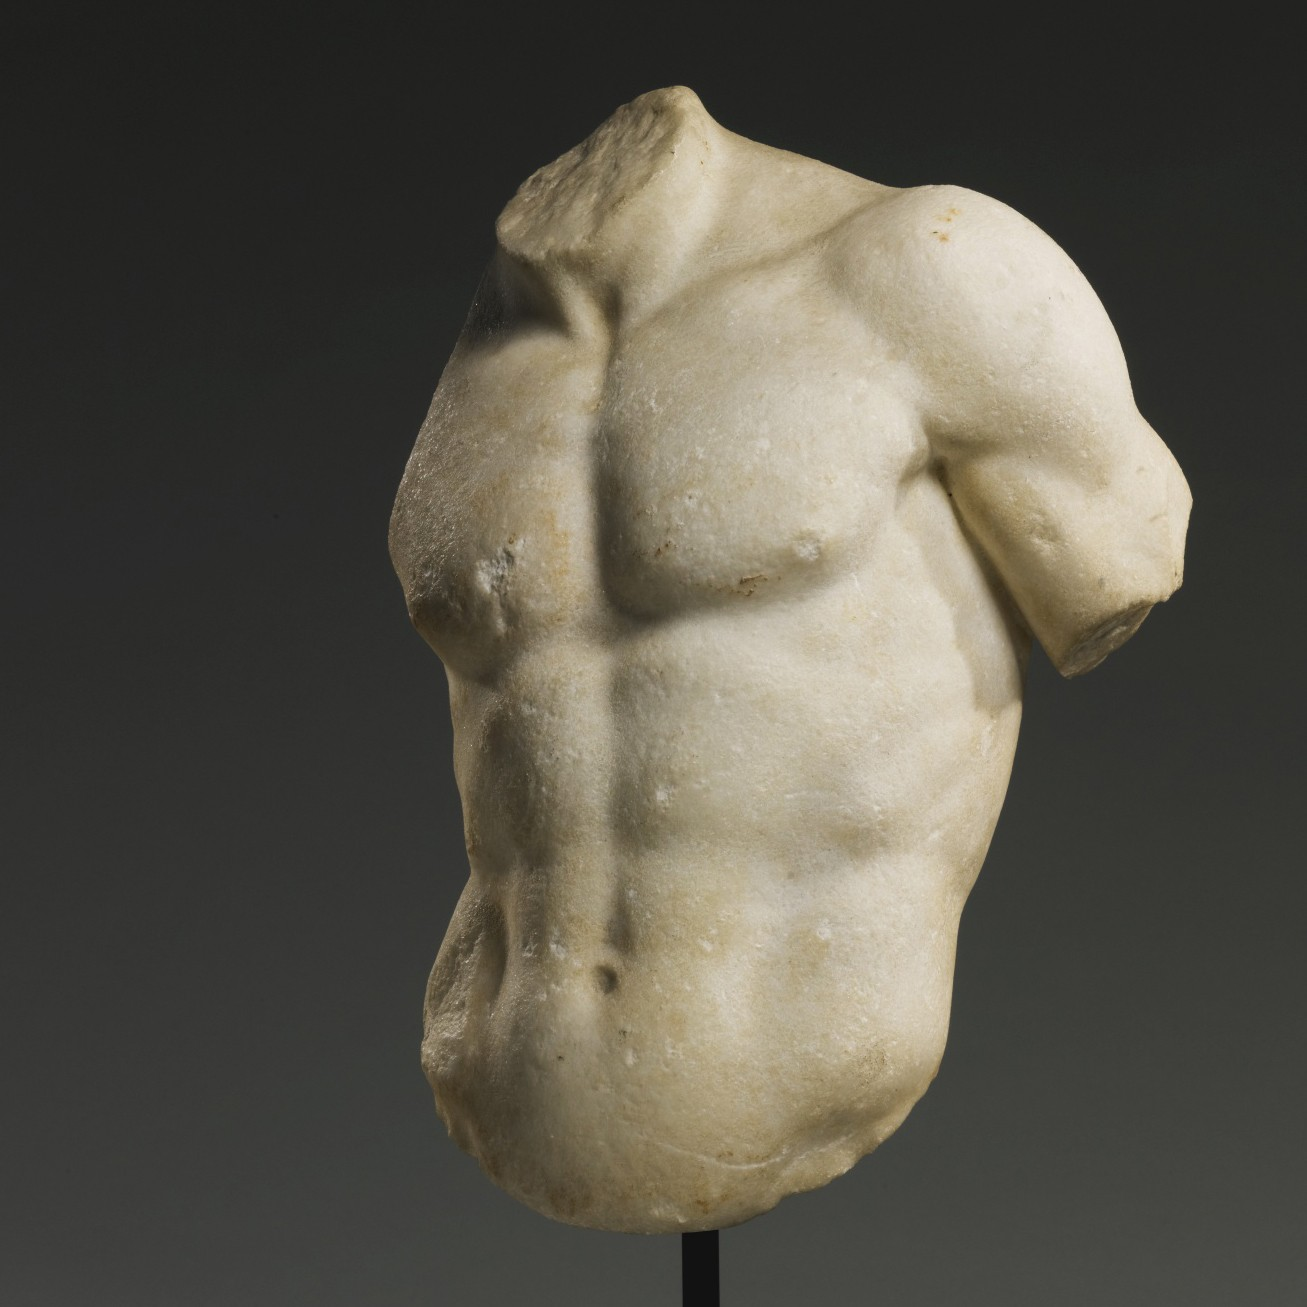 Скульптура Торс Древняя Греция